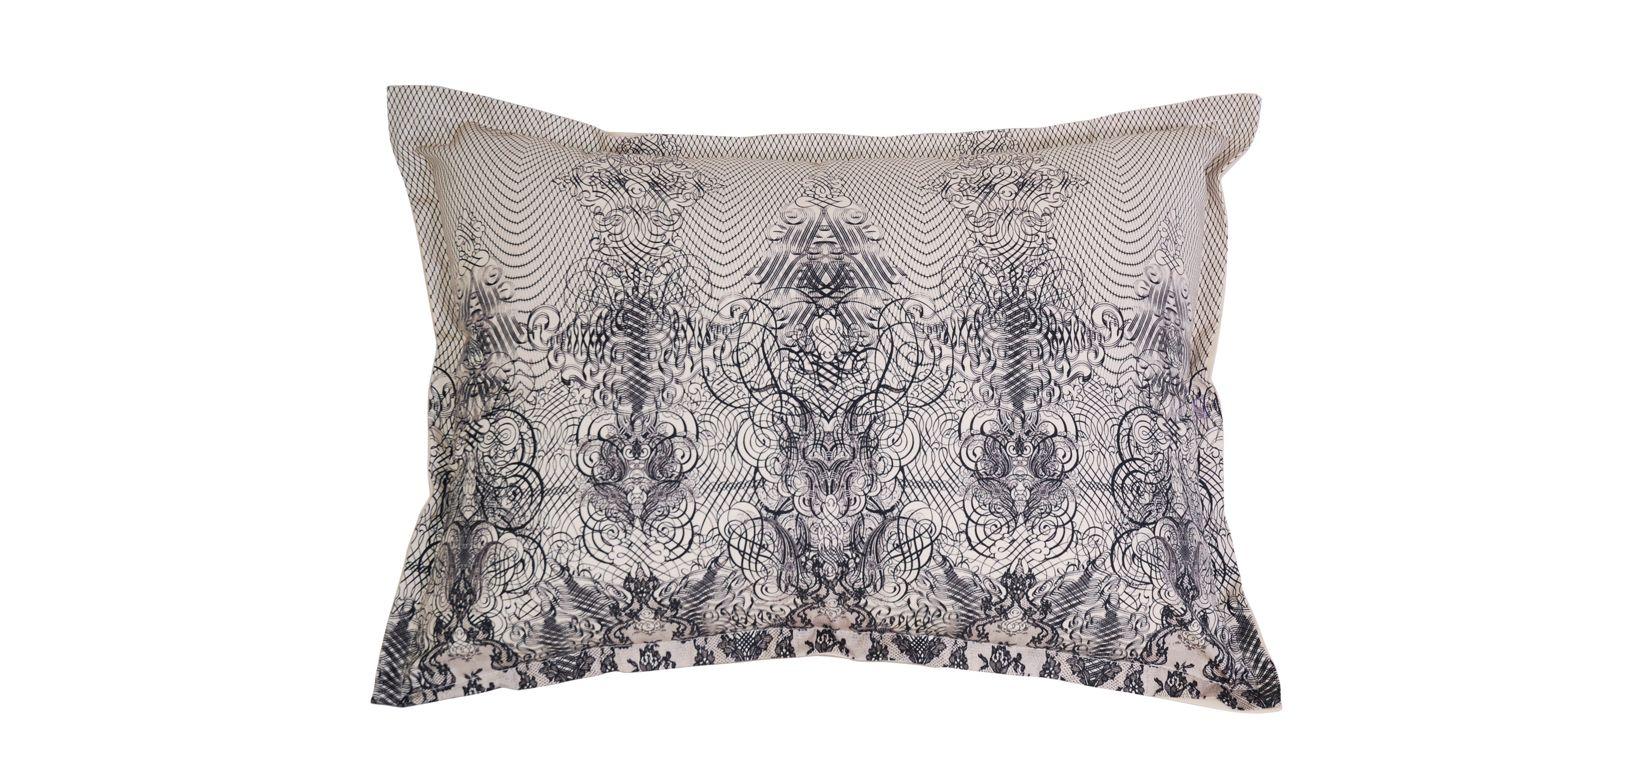 dentelle jean paul gaultier coussin roche bobois. Black Bedroom Furniture Sets. Home Design Ideas